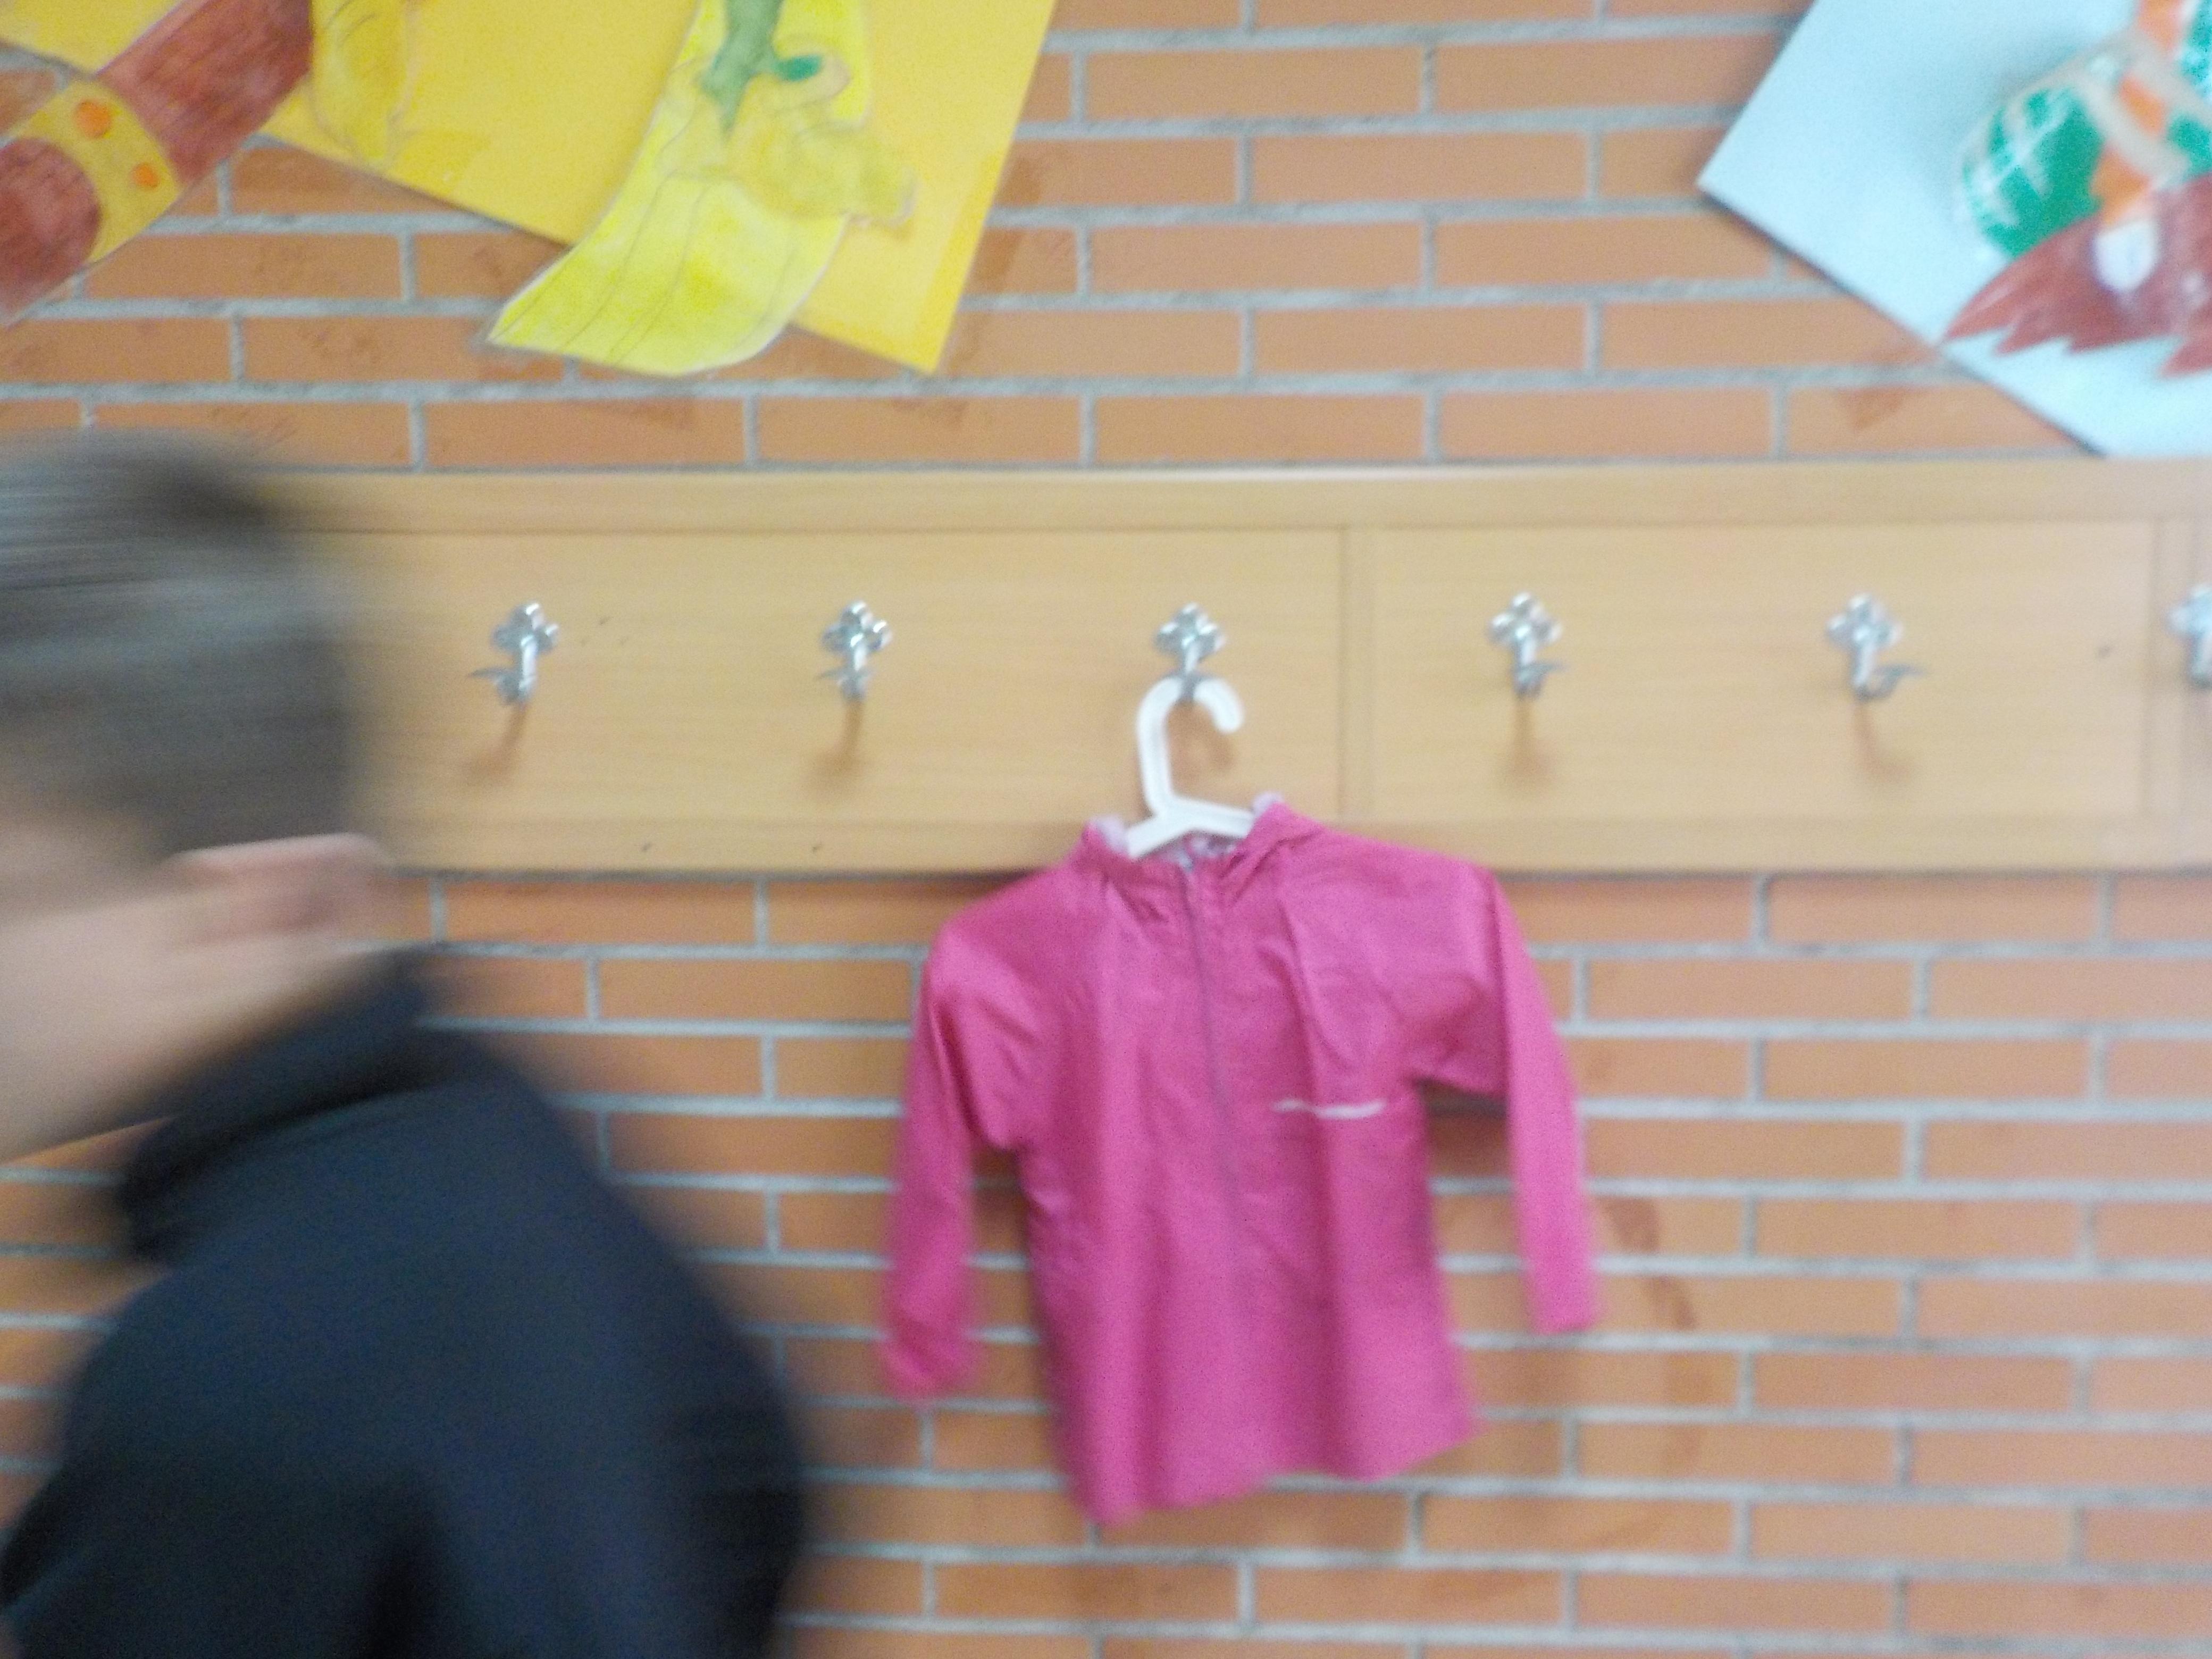 Catalogo de ropa olvidada 1  2018 13